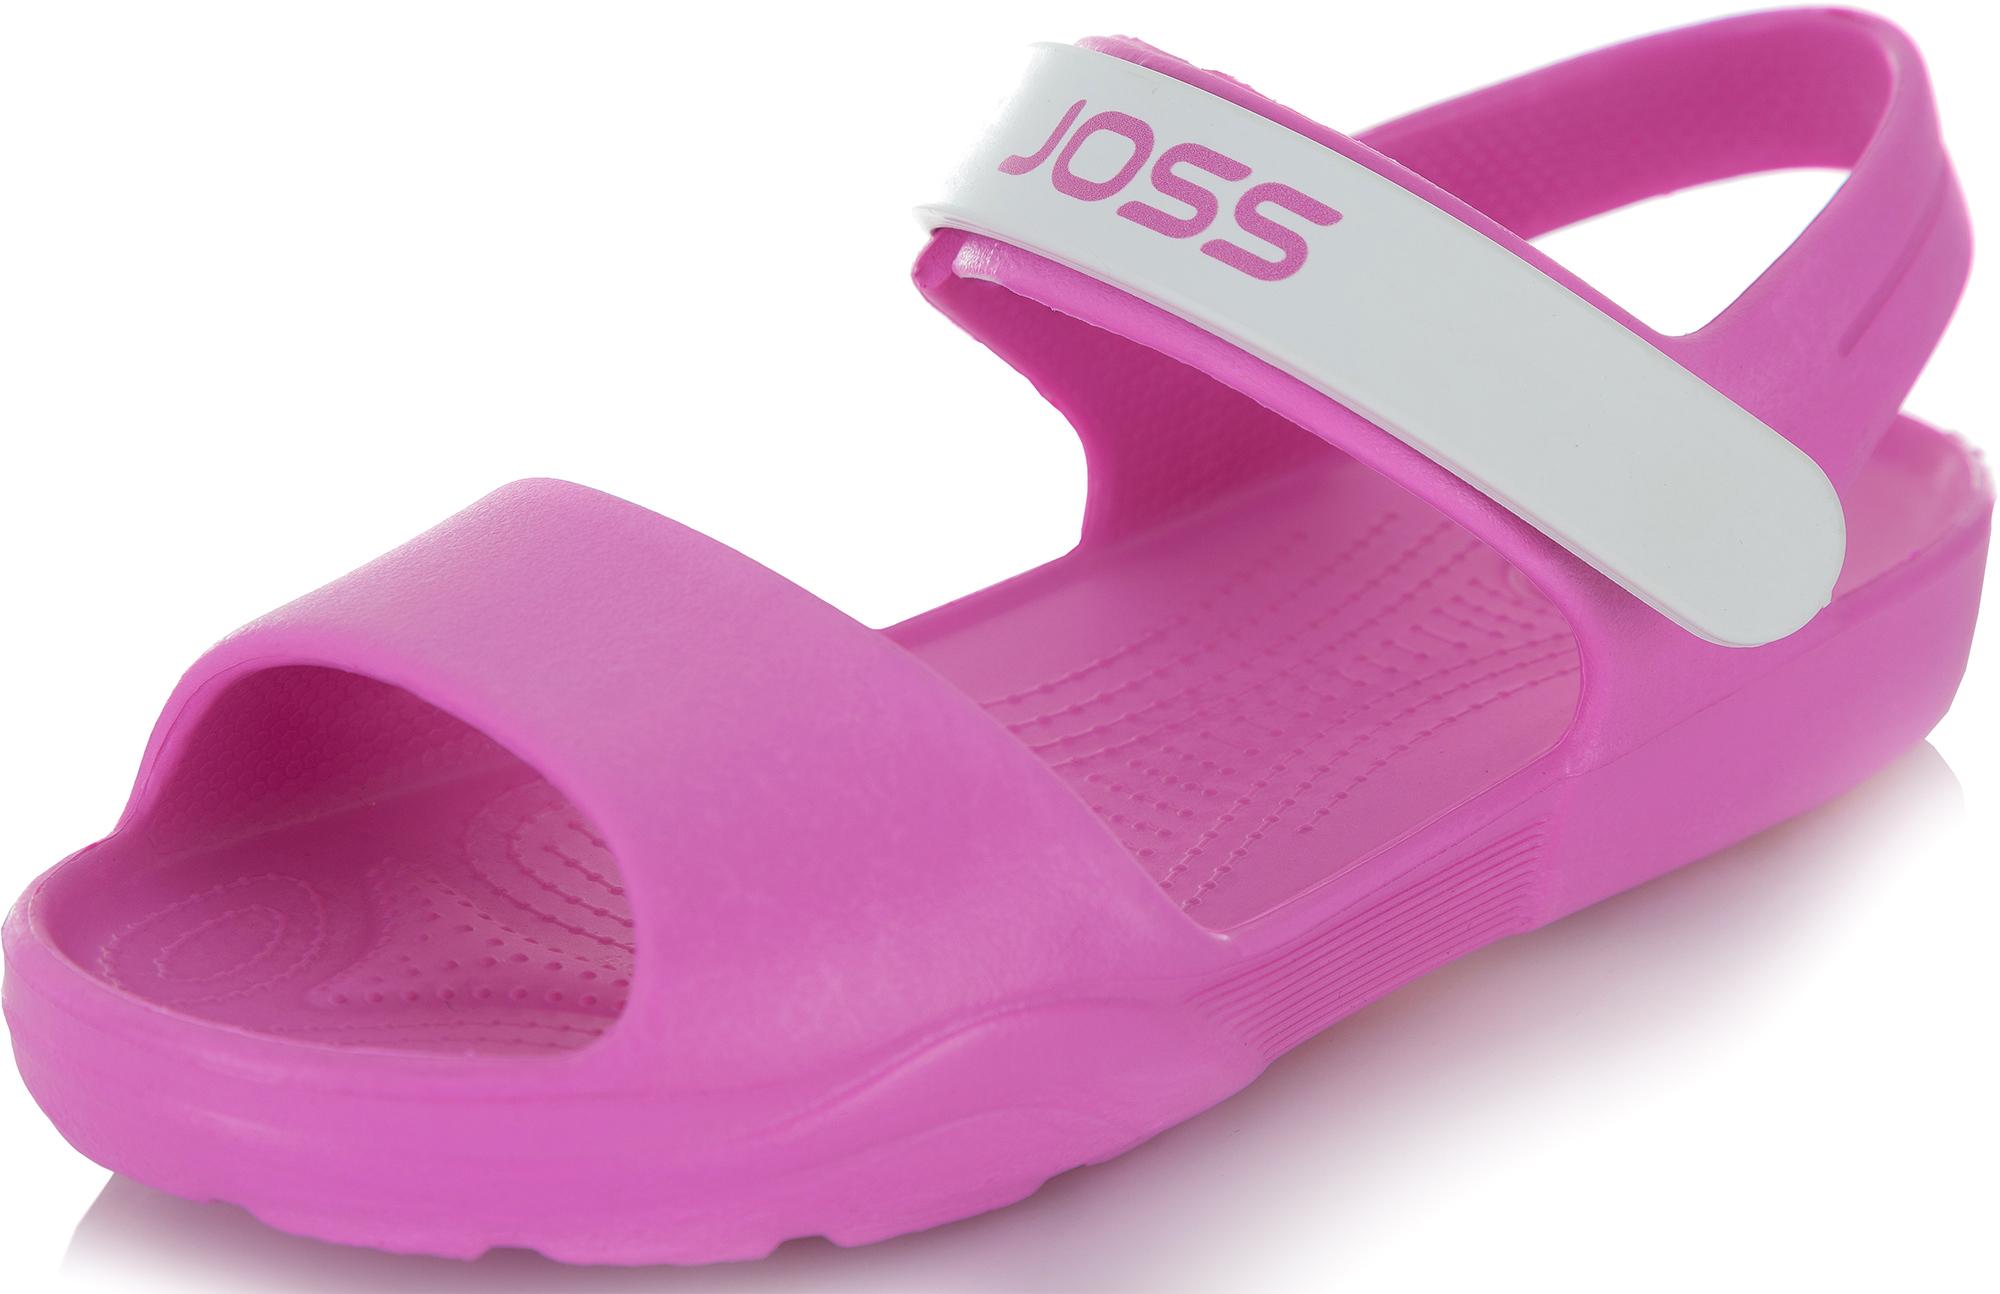 Joss Шлепанцы для девочек Joss G-Sand, размер 34-35 цены онлайн